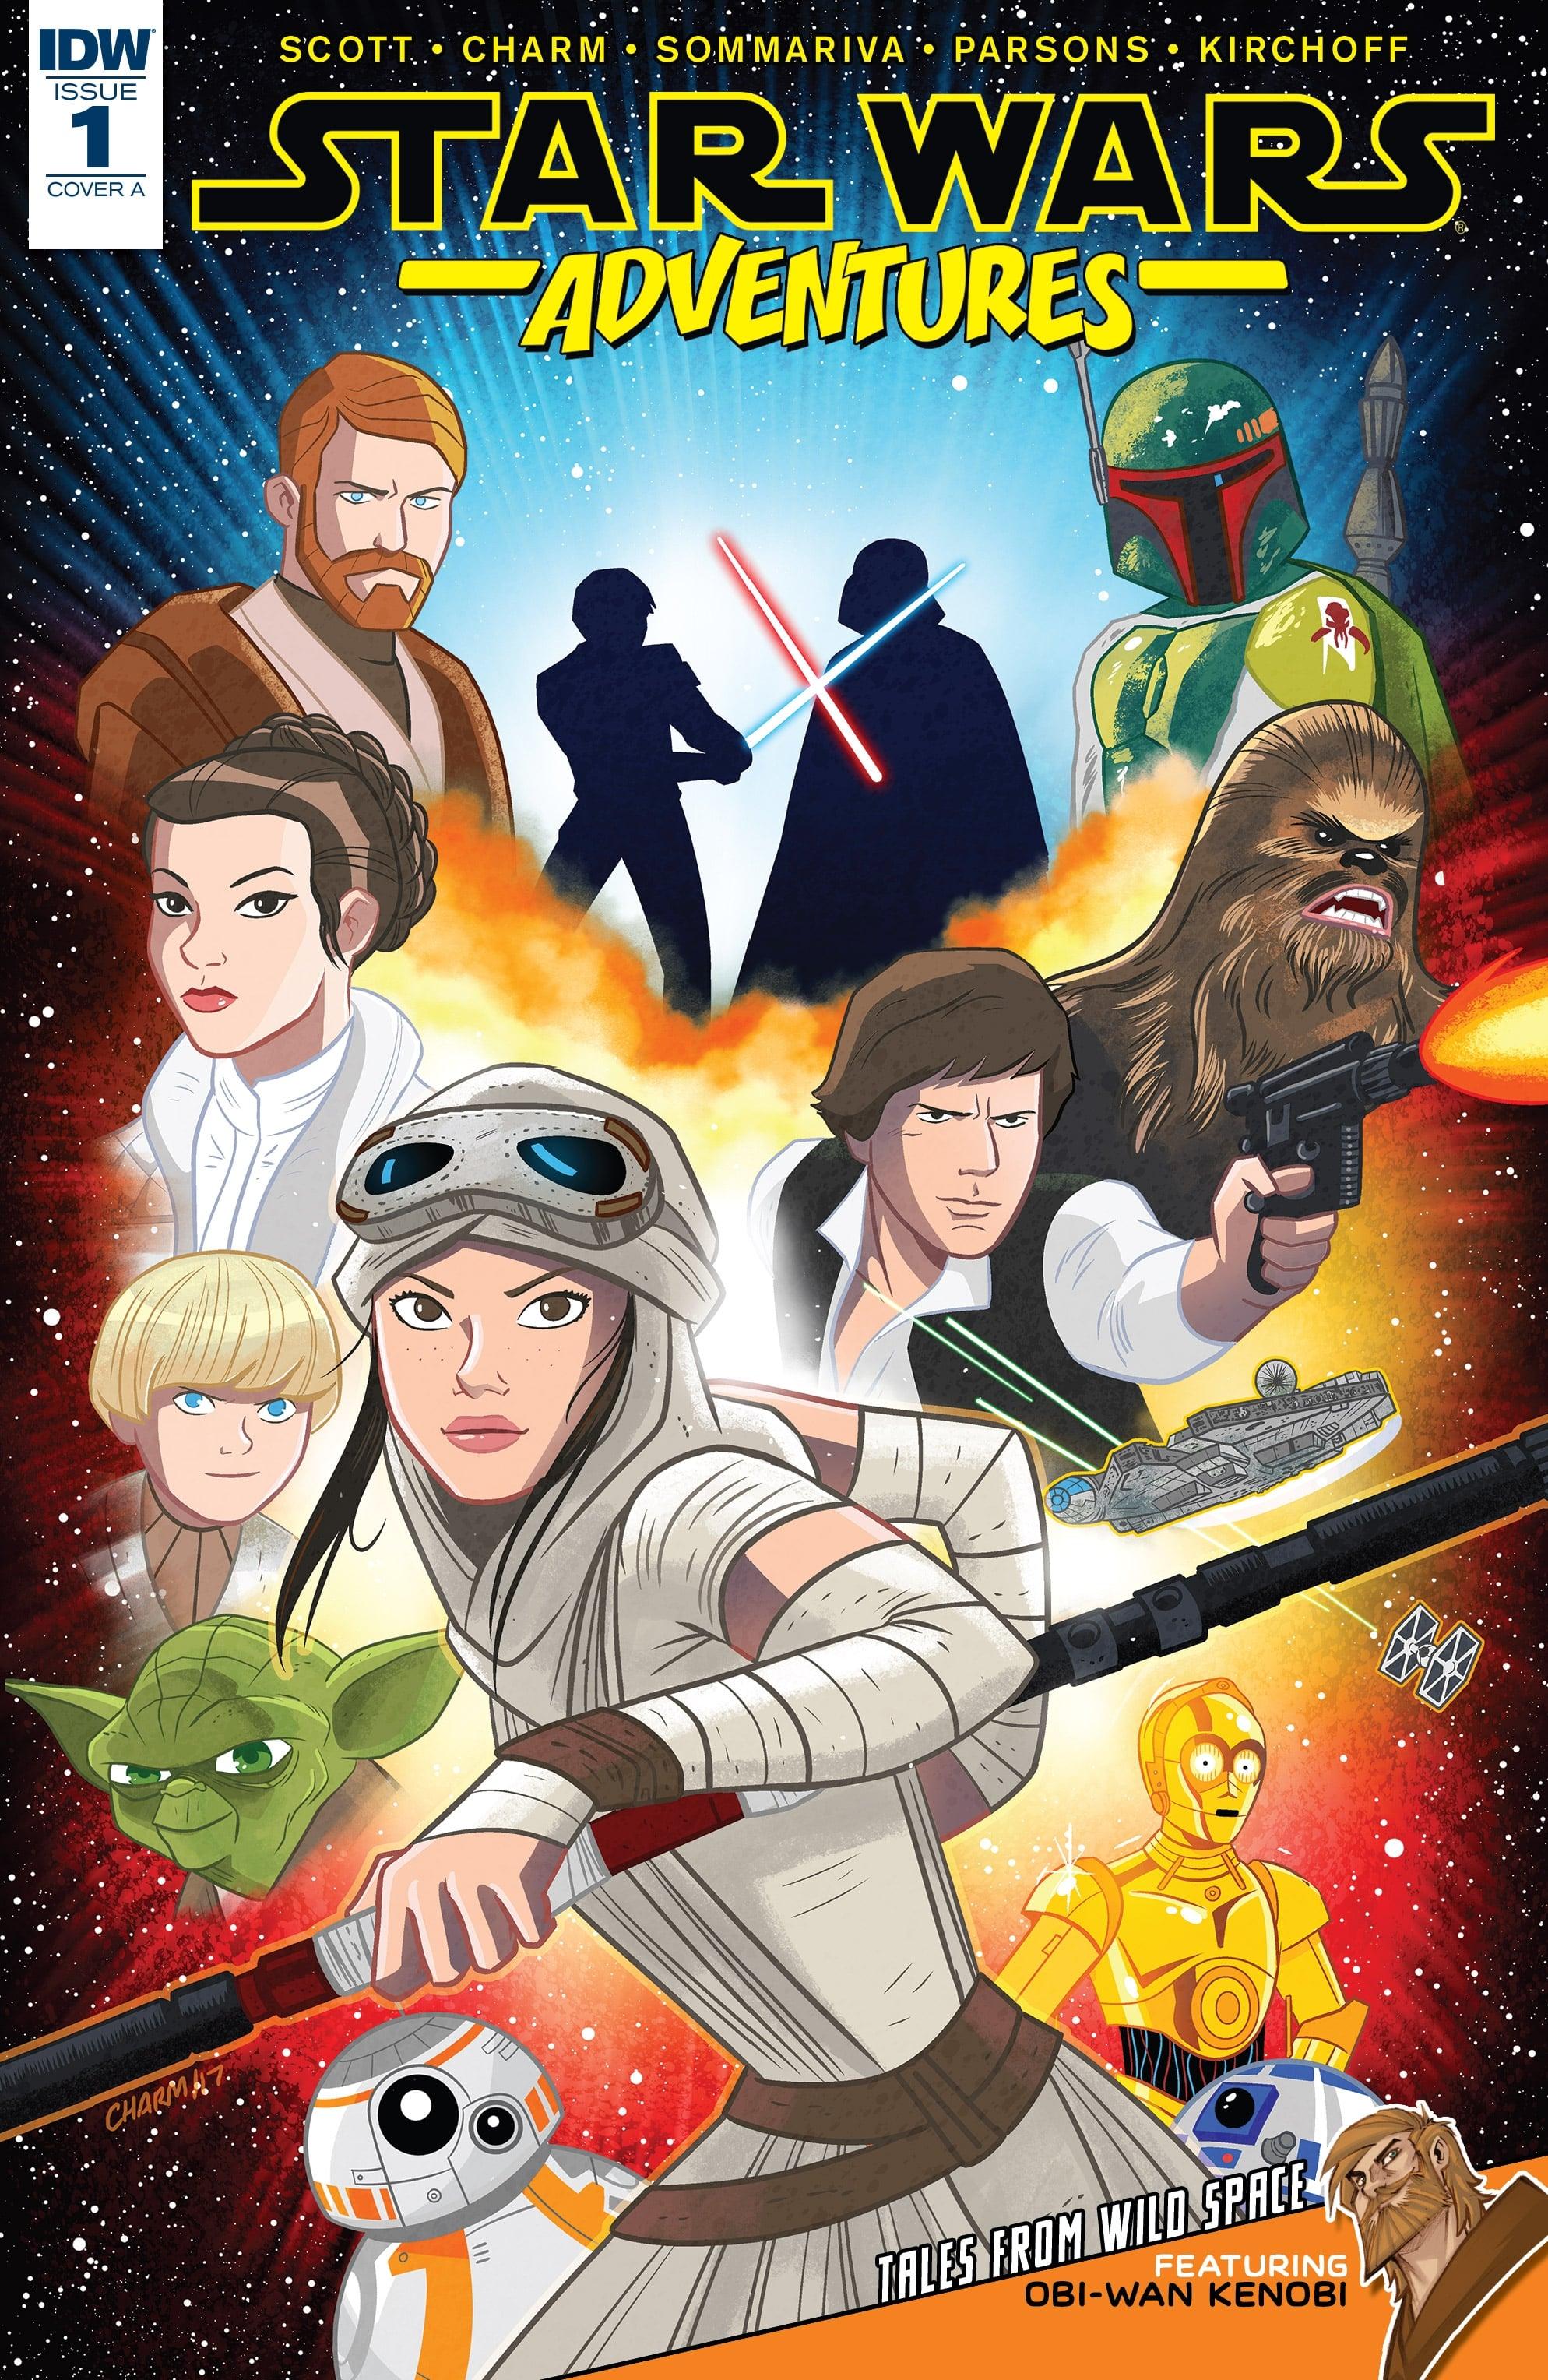 Star Wars Adventures #11